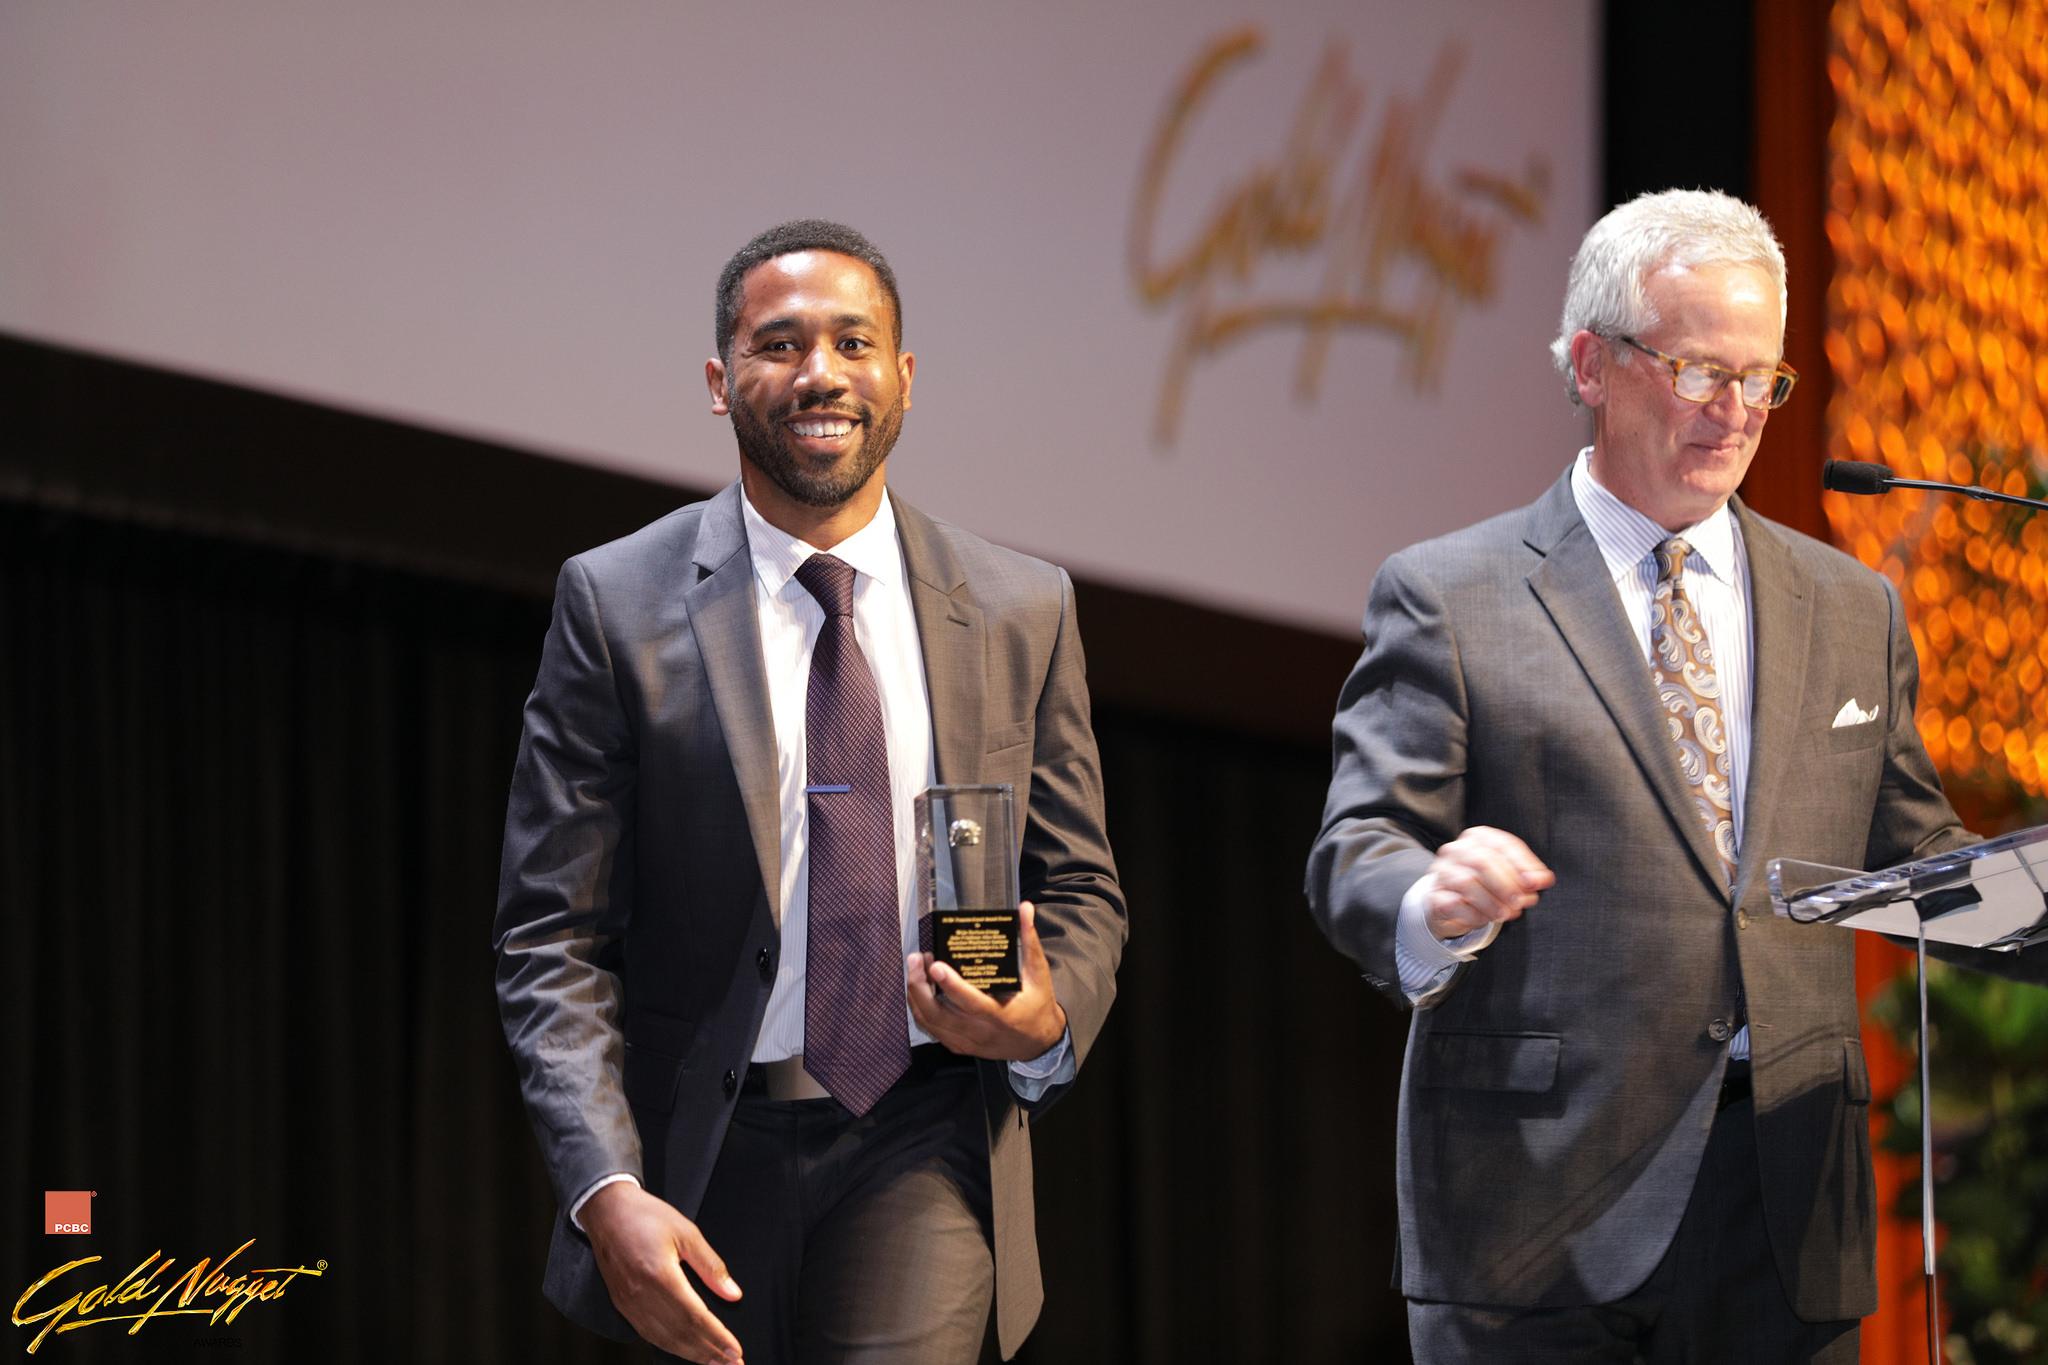 2017-06-29_Gold Nugget Awards_DG.jpg